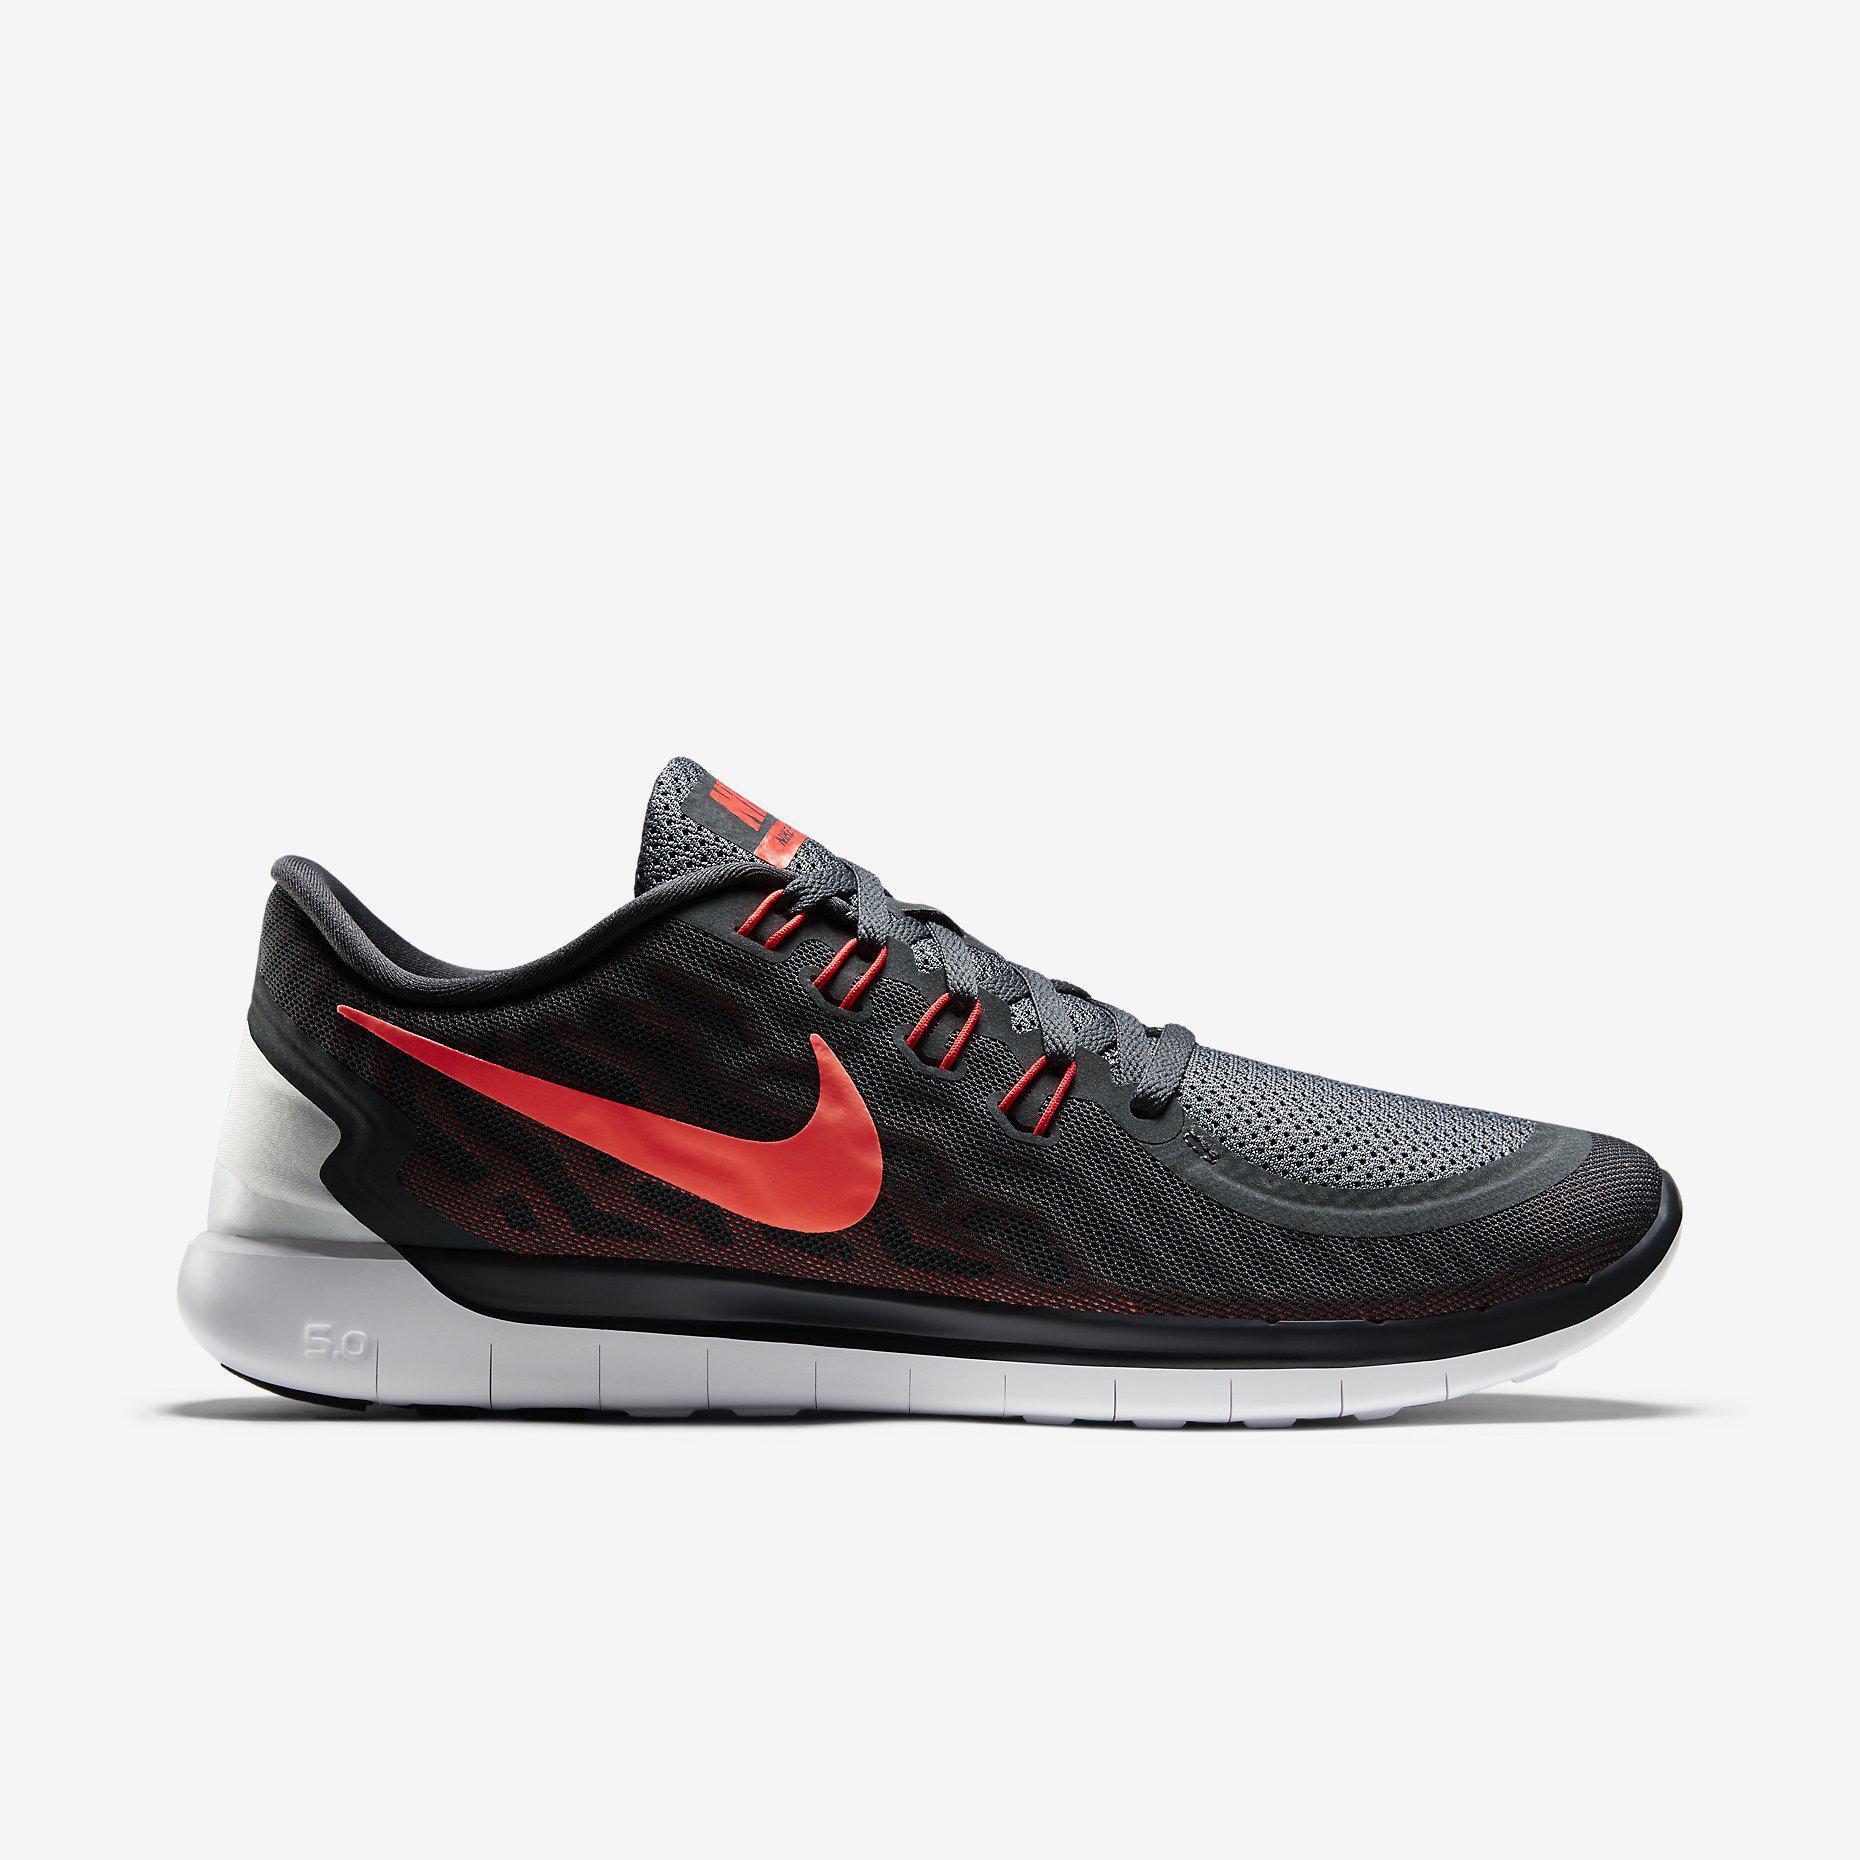 84fe7897c2f9 Nike Mens Free 5.0+ Running Shoes - Anthracite Bright Crimson -  Tennisnuts.com